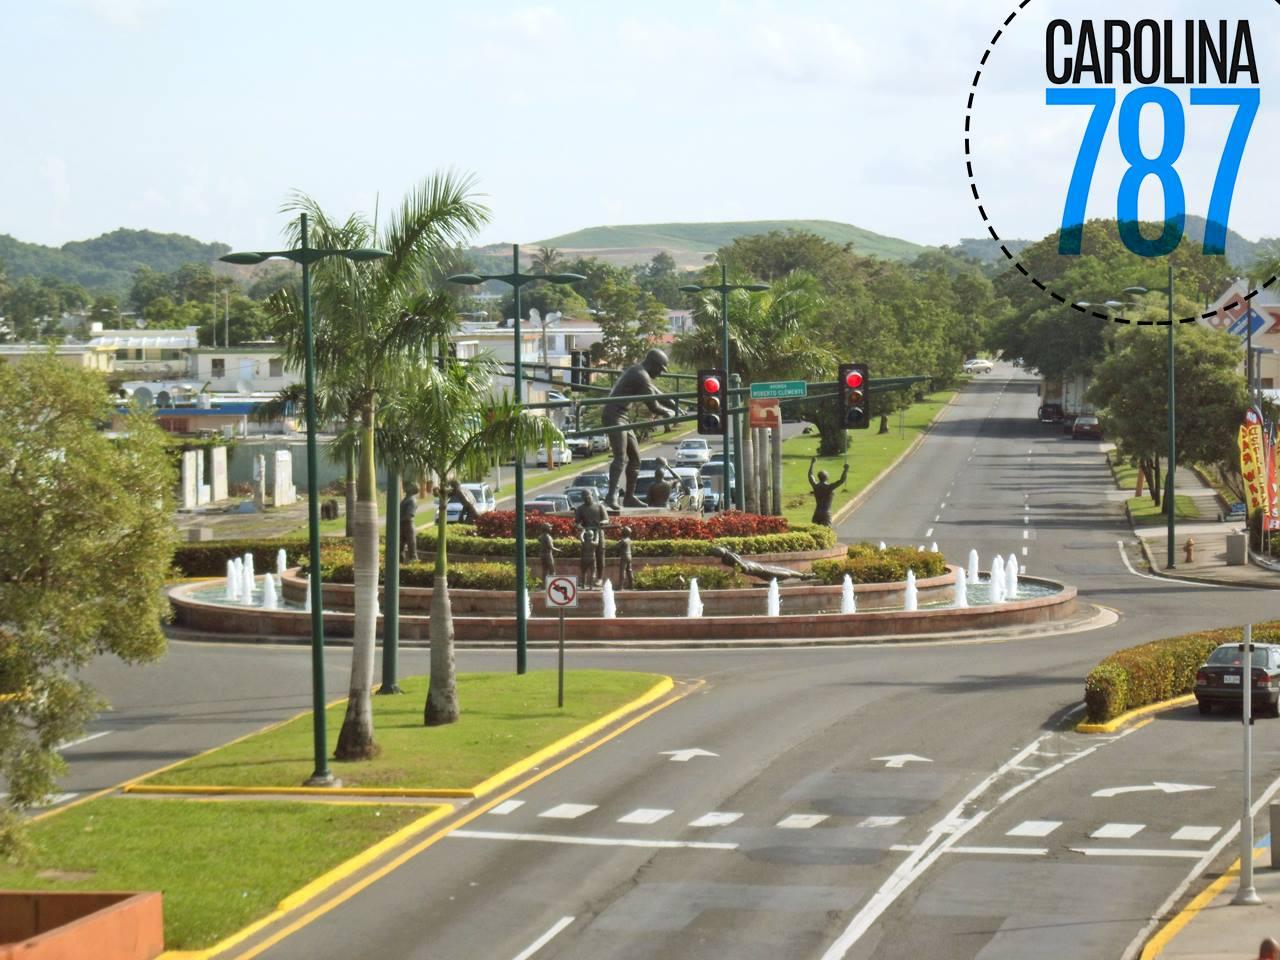 Rotonda entre la Avenida Roberto Clemente y Avenida Monserrate, Carolina.